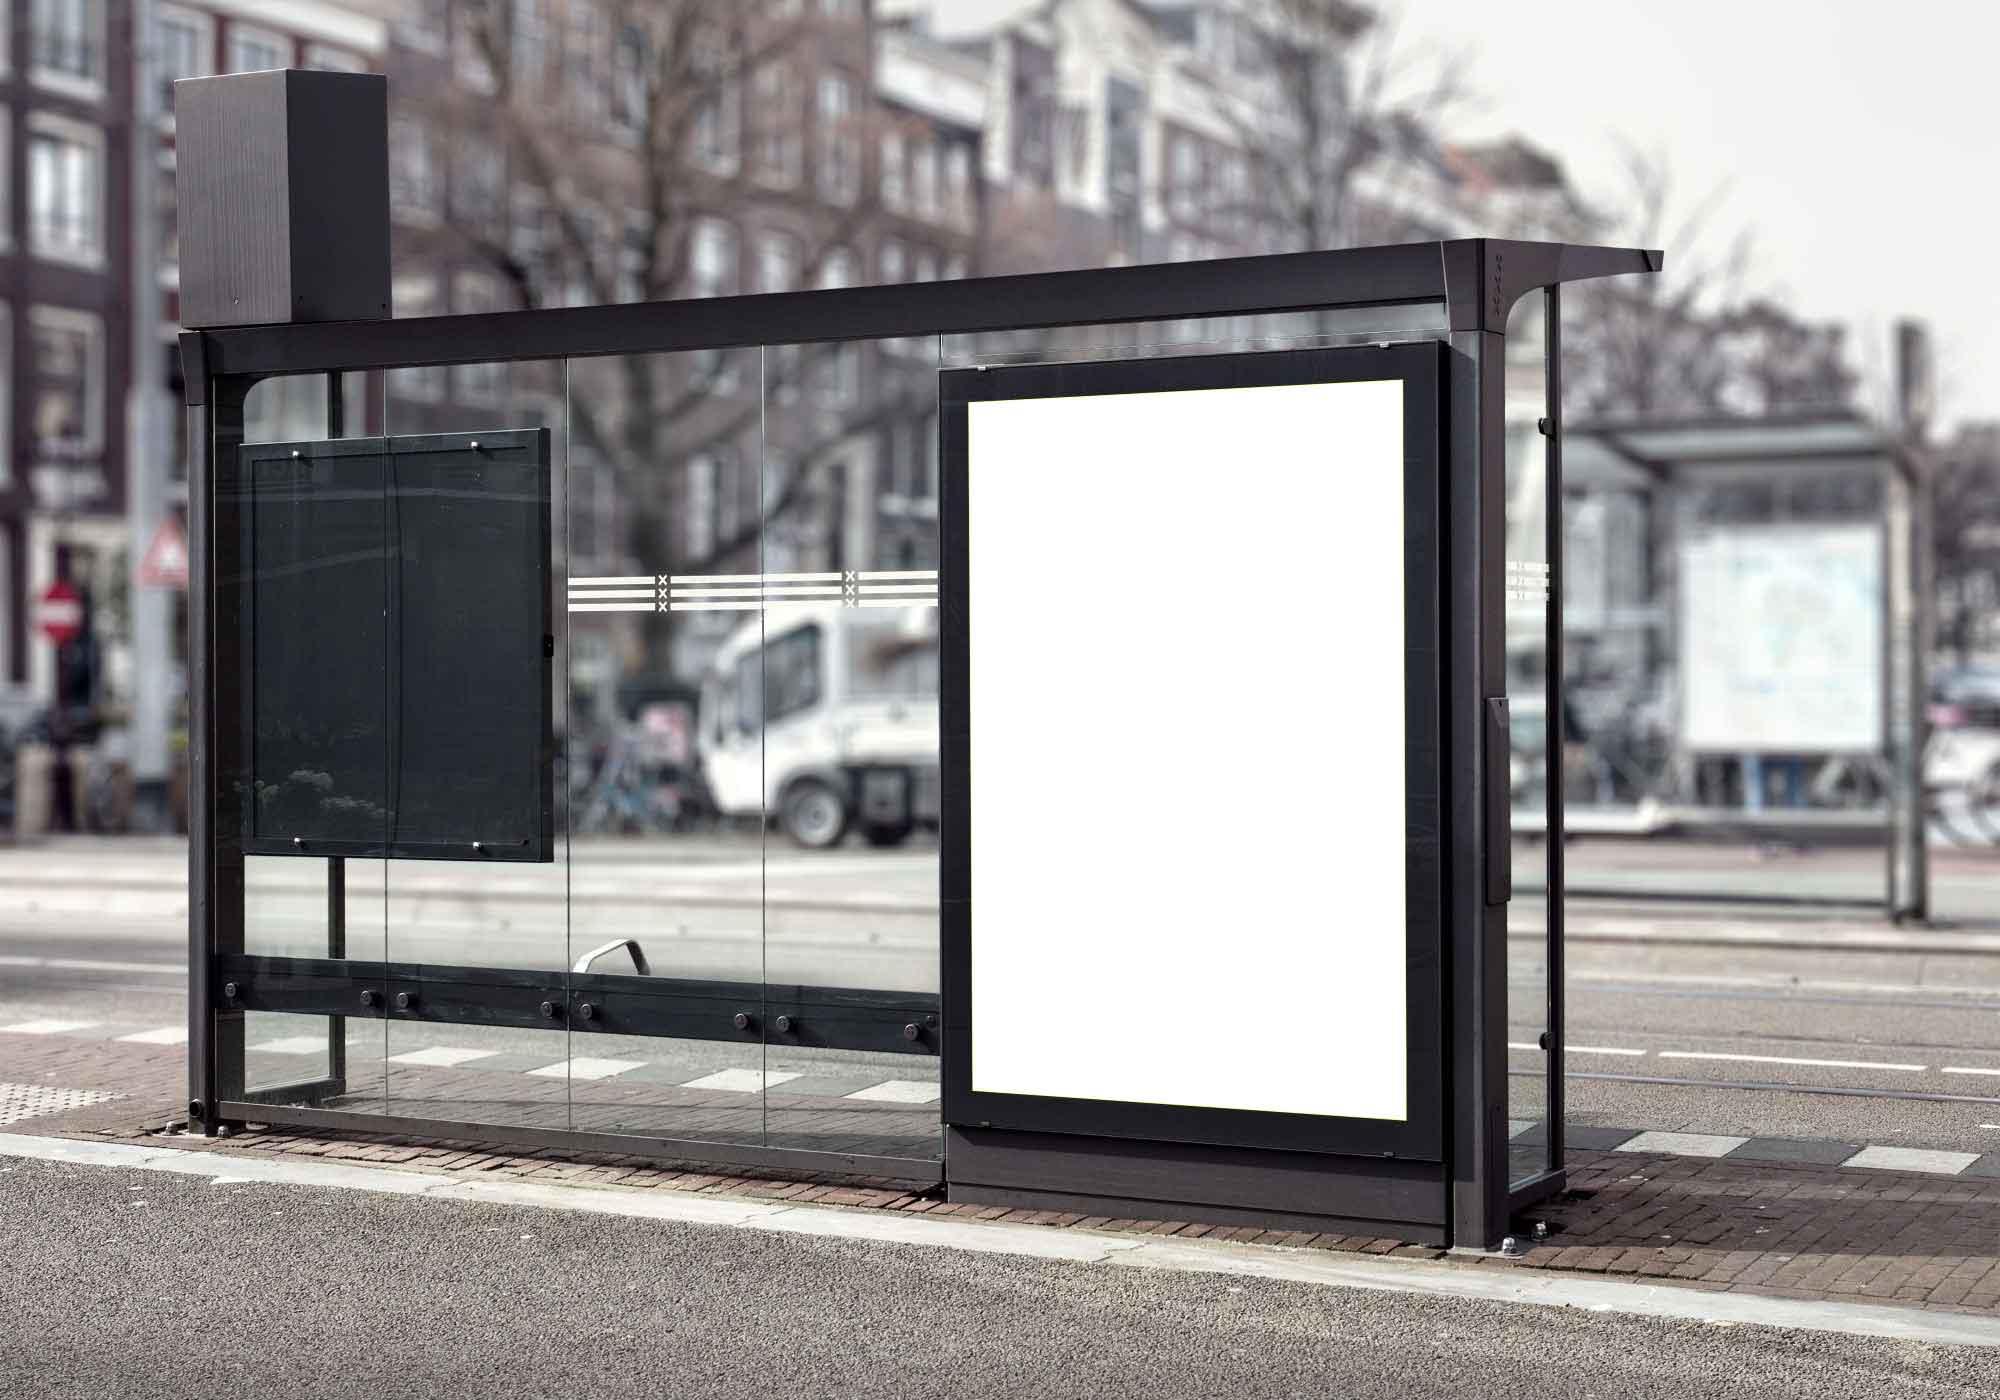 Bus Stop Billboard Mockup 2